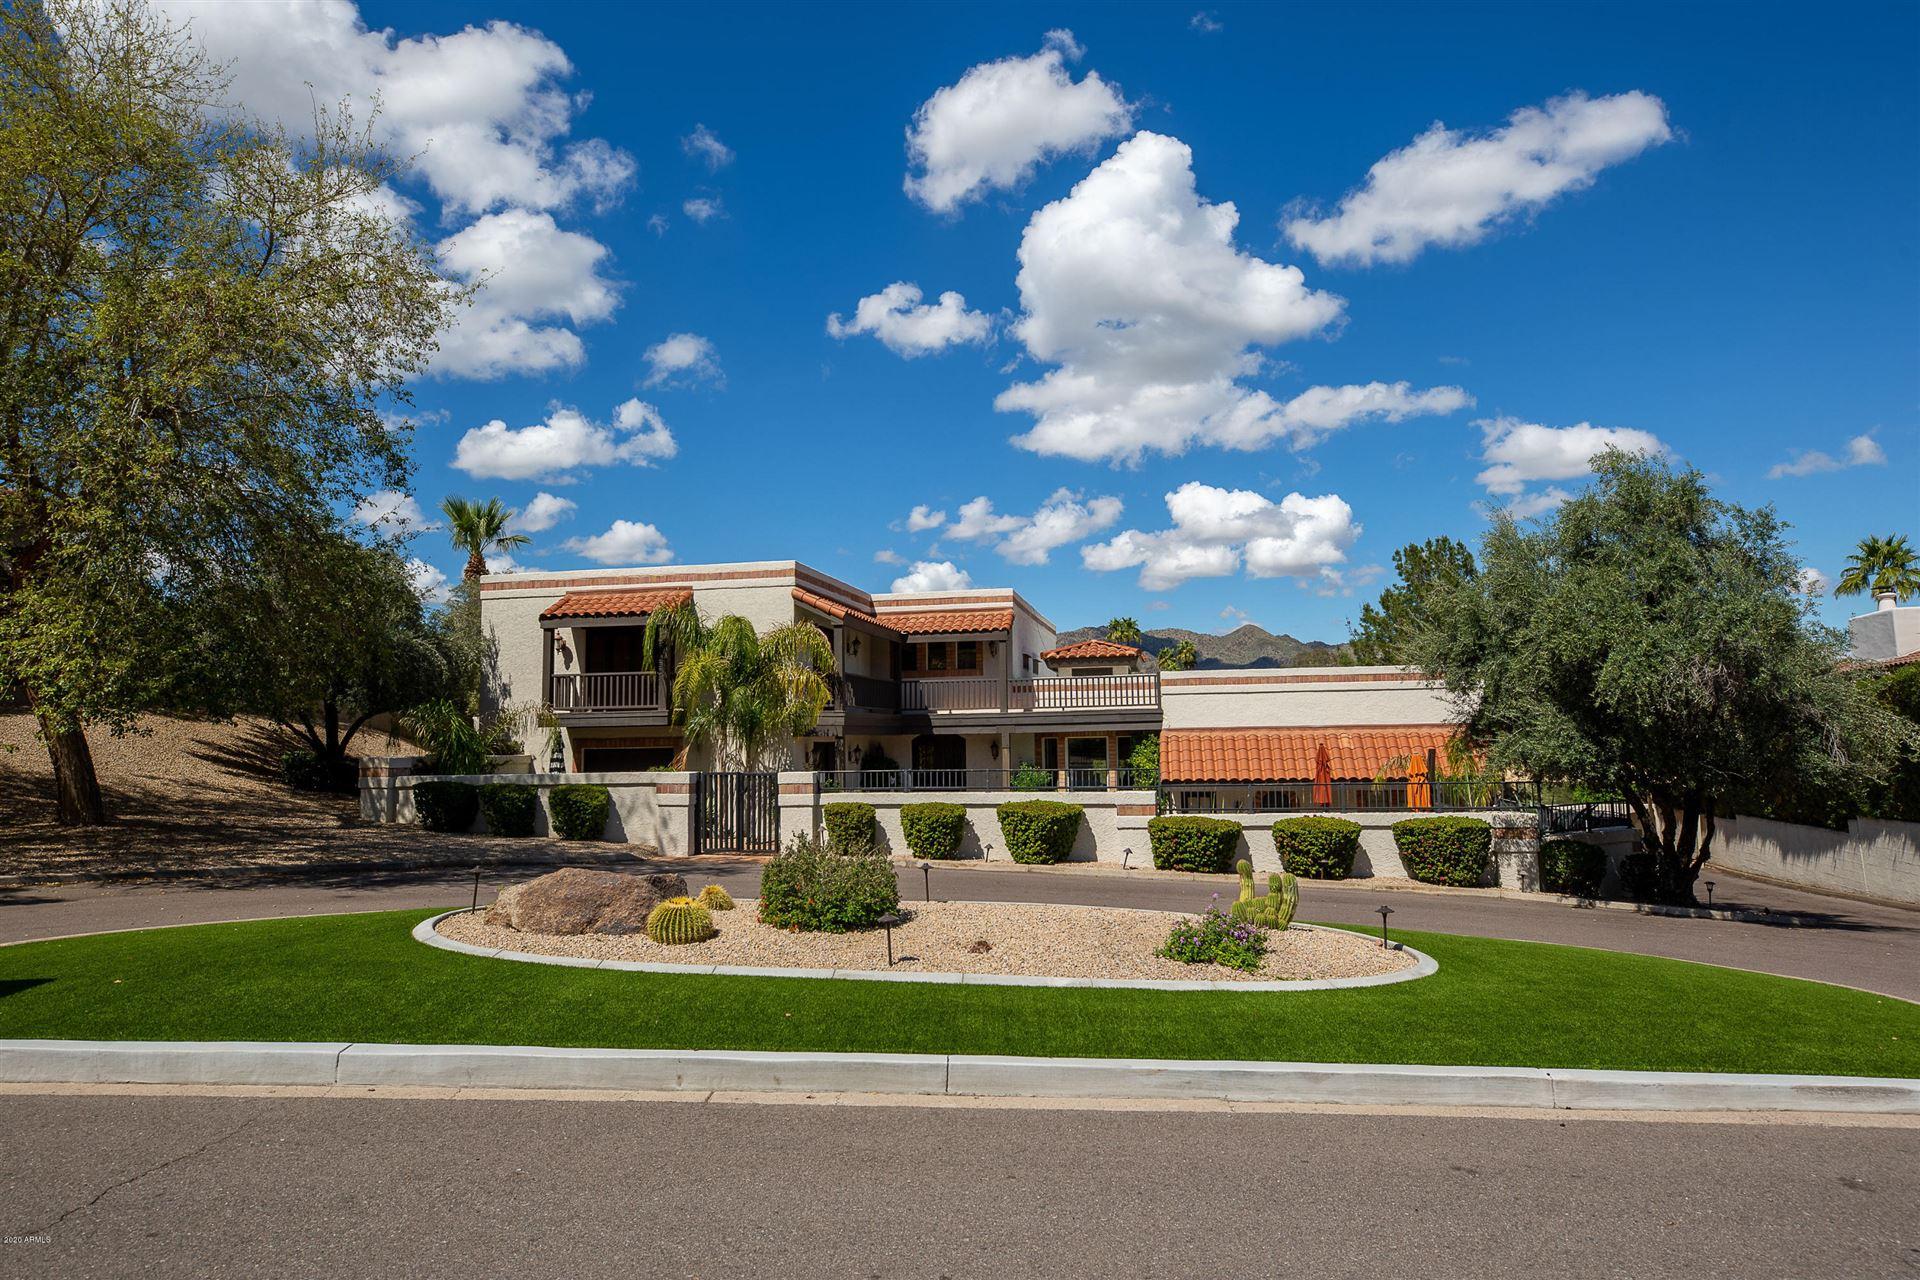 4814 E MARSTON Drive, Paradise Valley, AZ 85253 - MLS#: 6067943